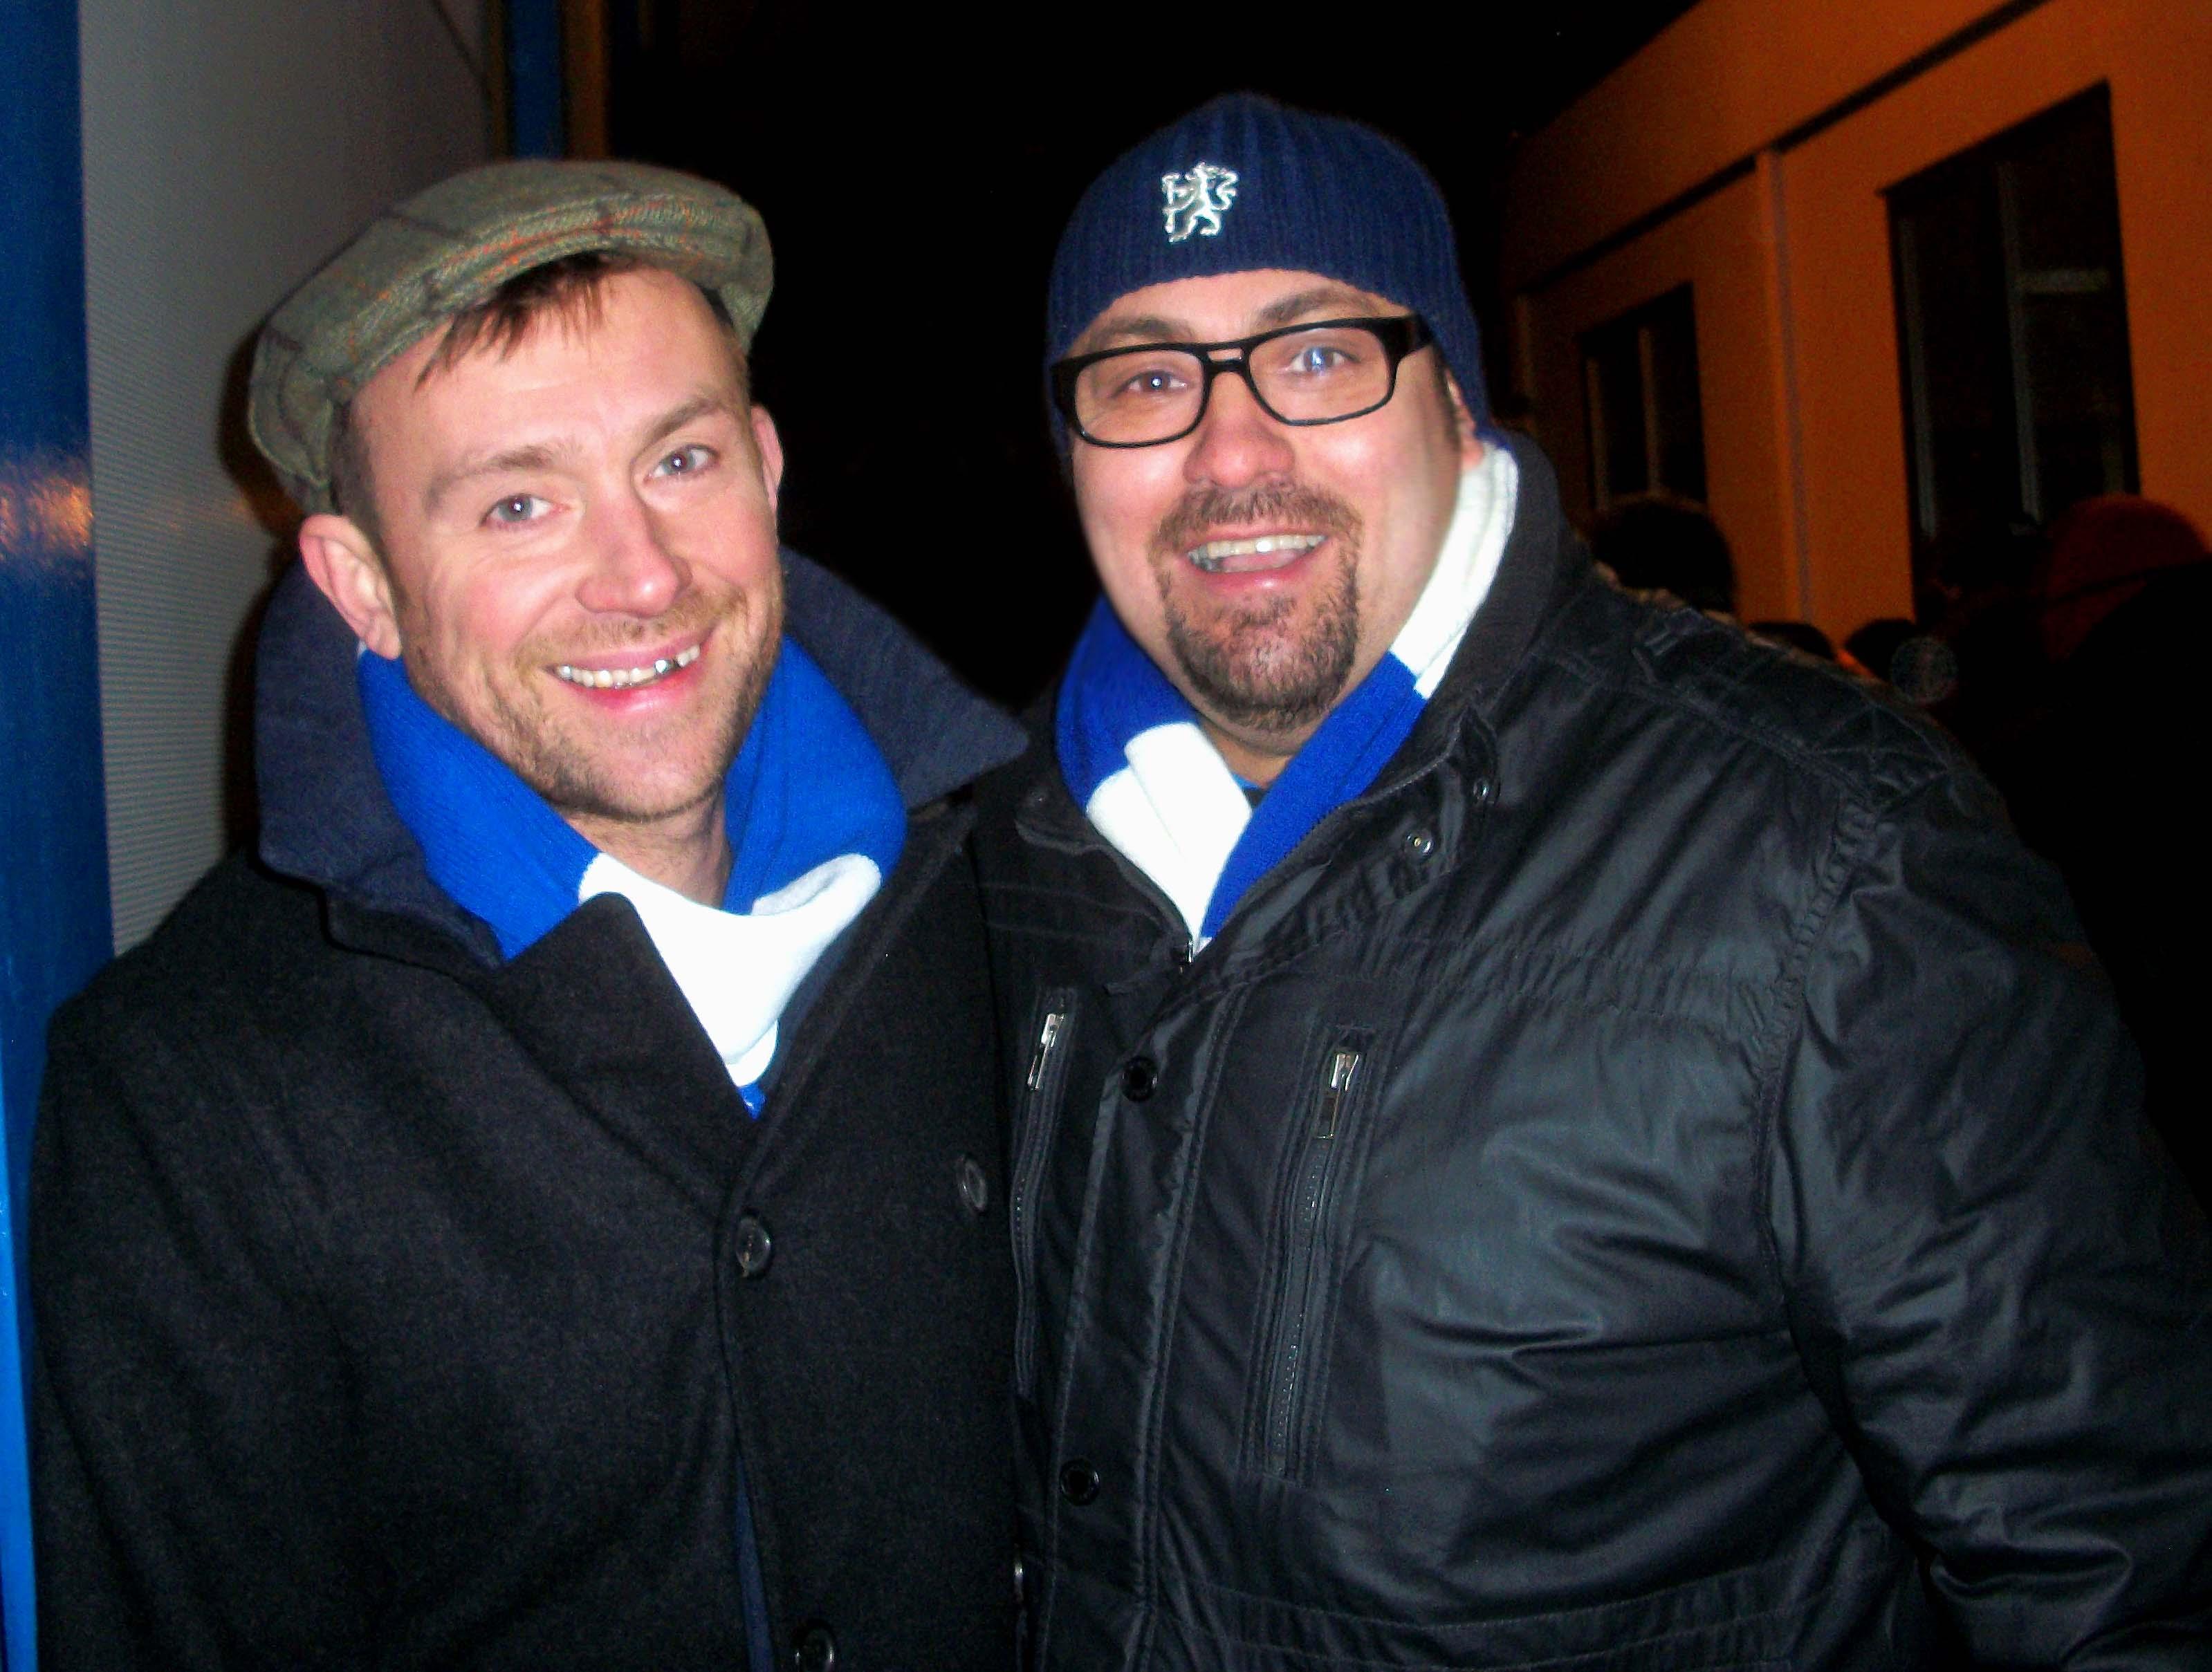 Damon Albarn & Dave Sherwood